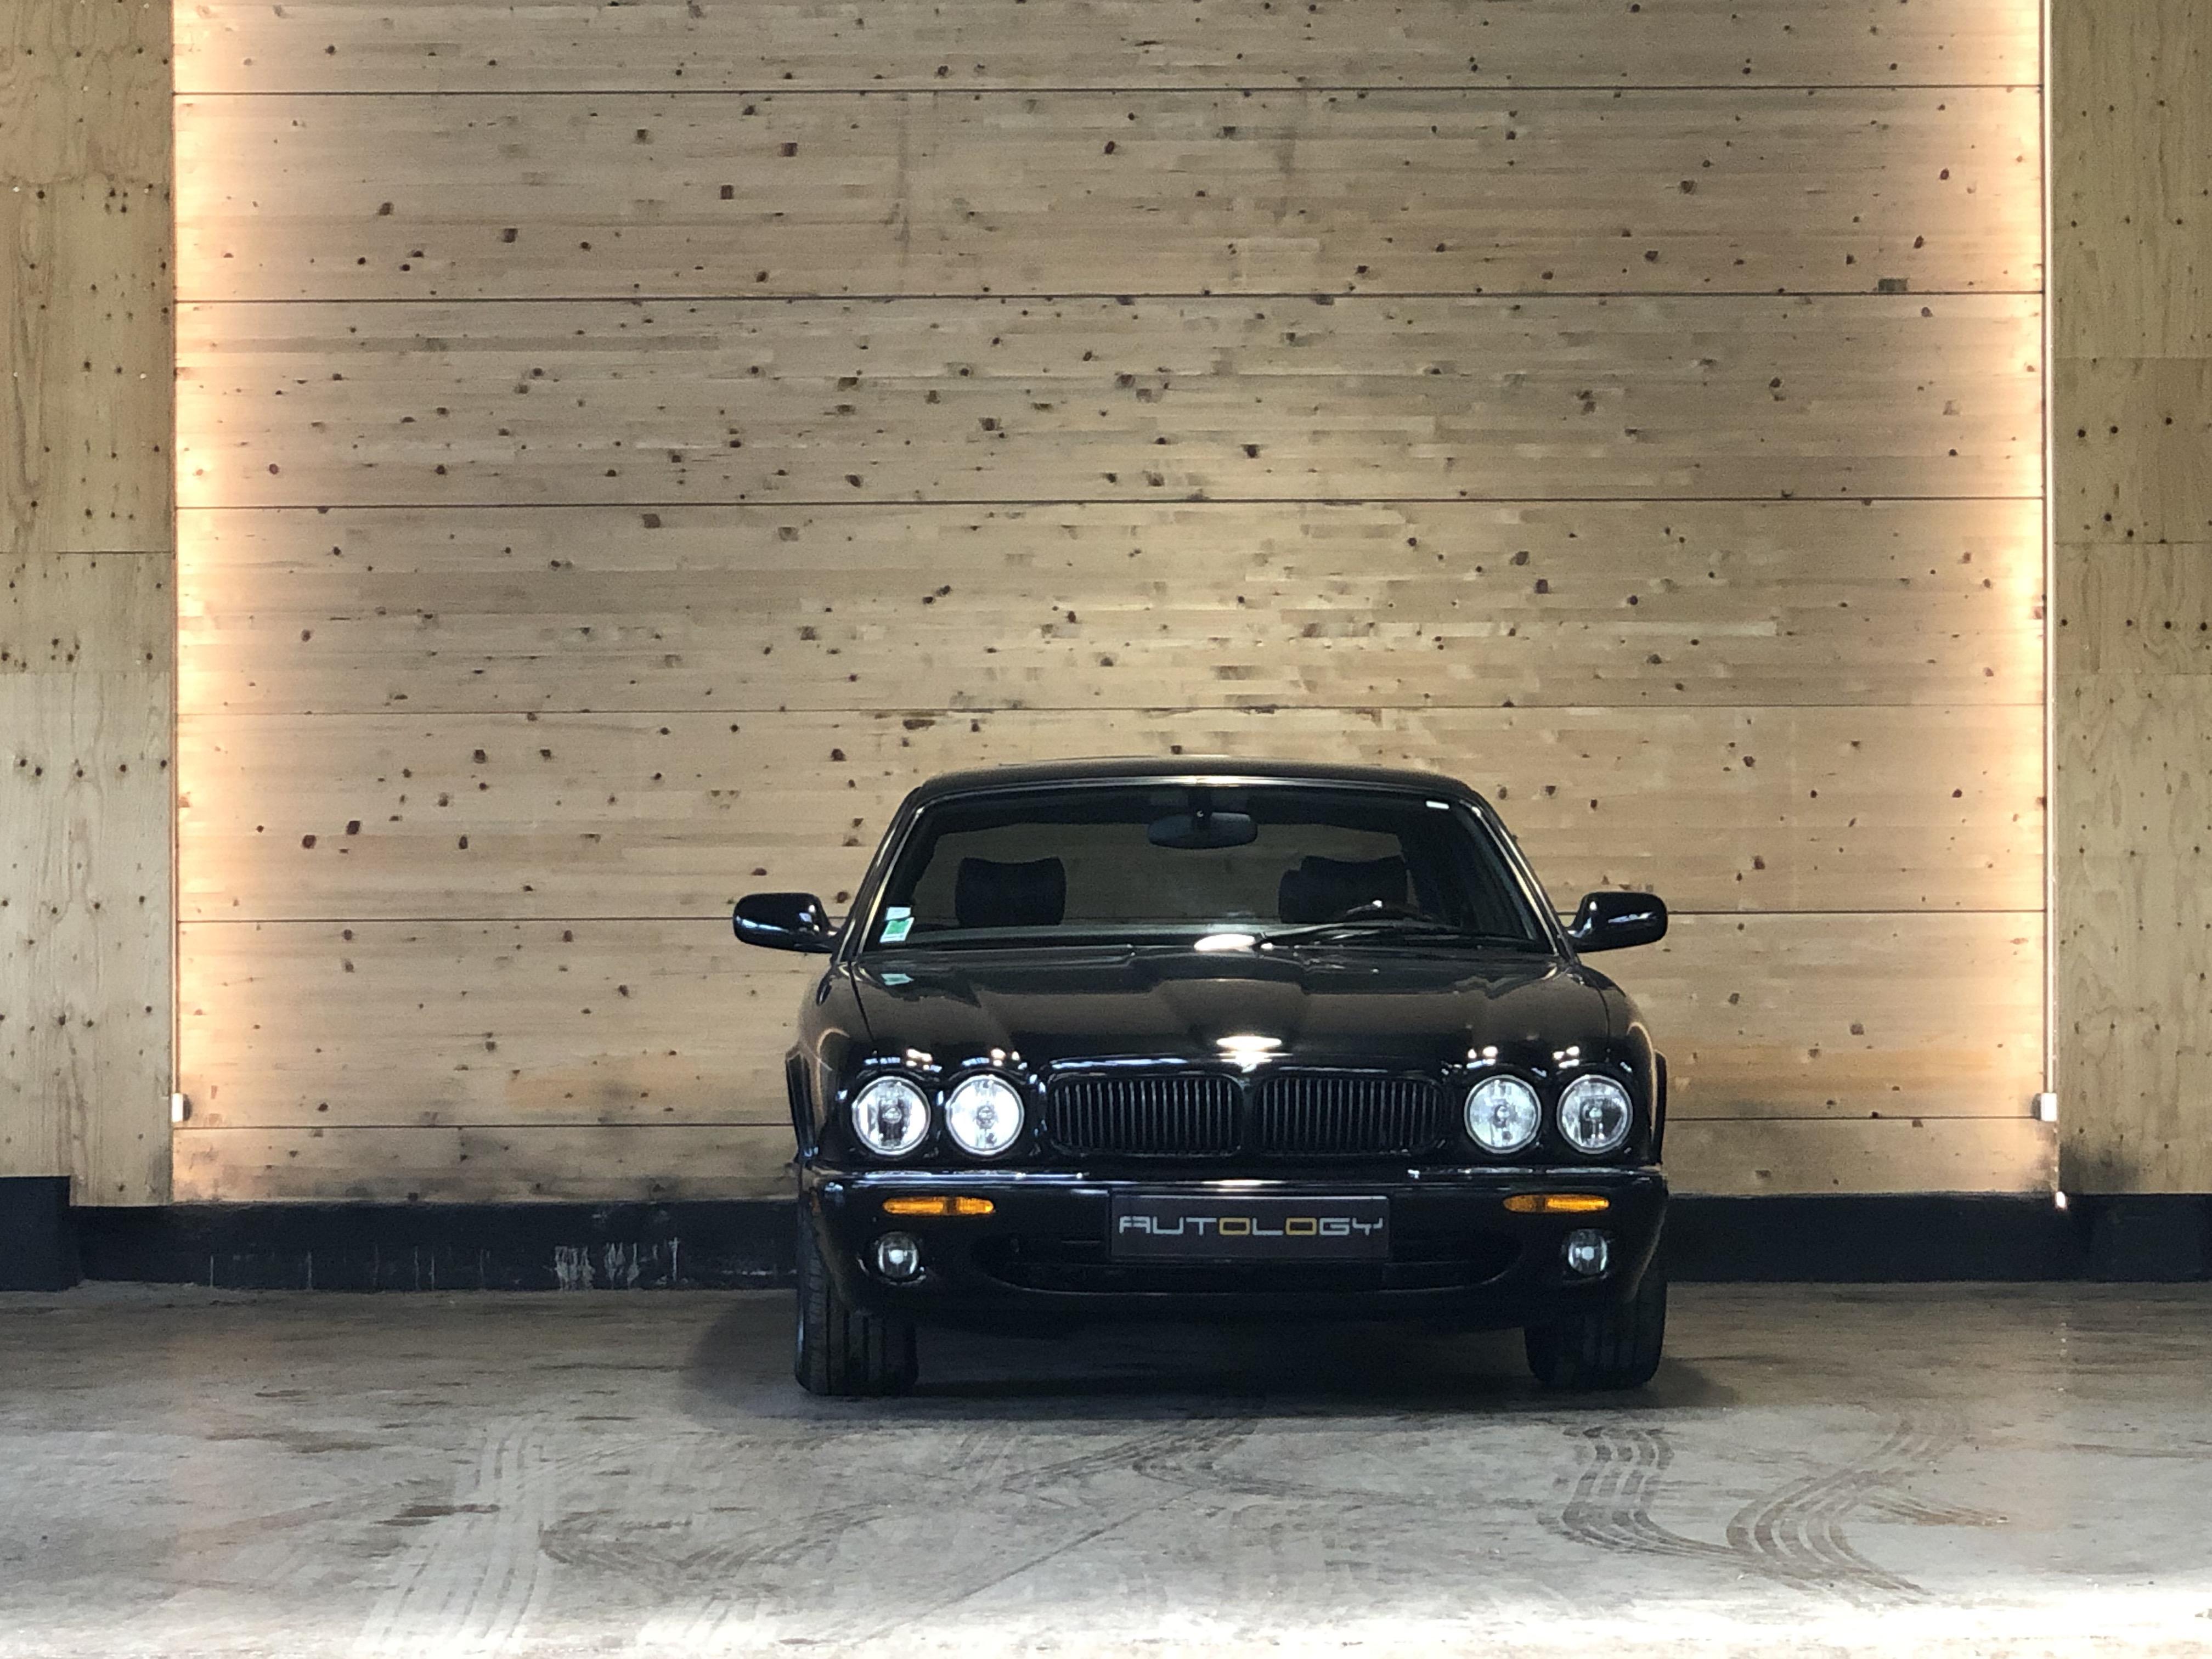 Daimler V8 4.0 BVA (X308)